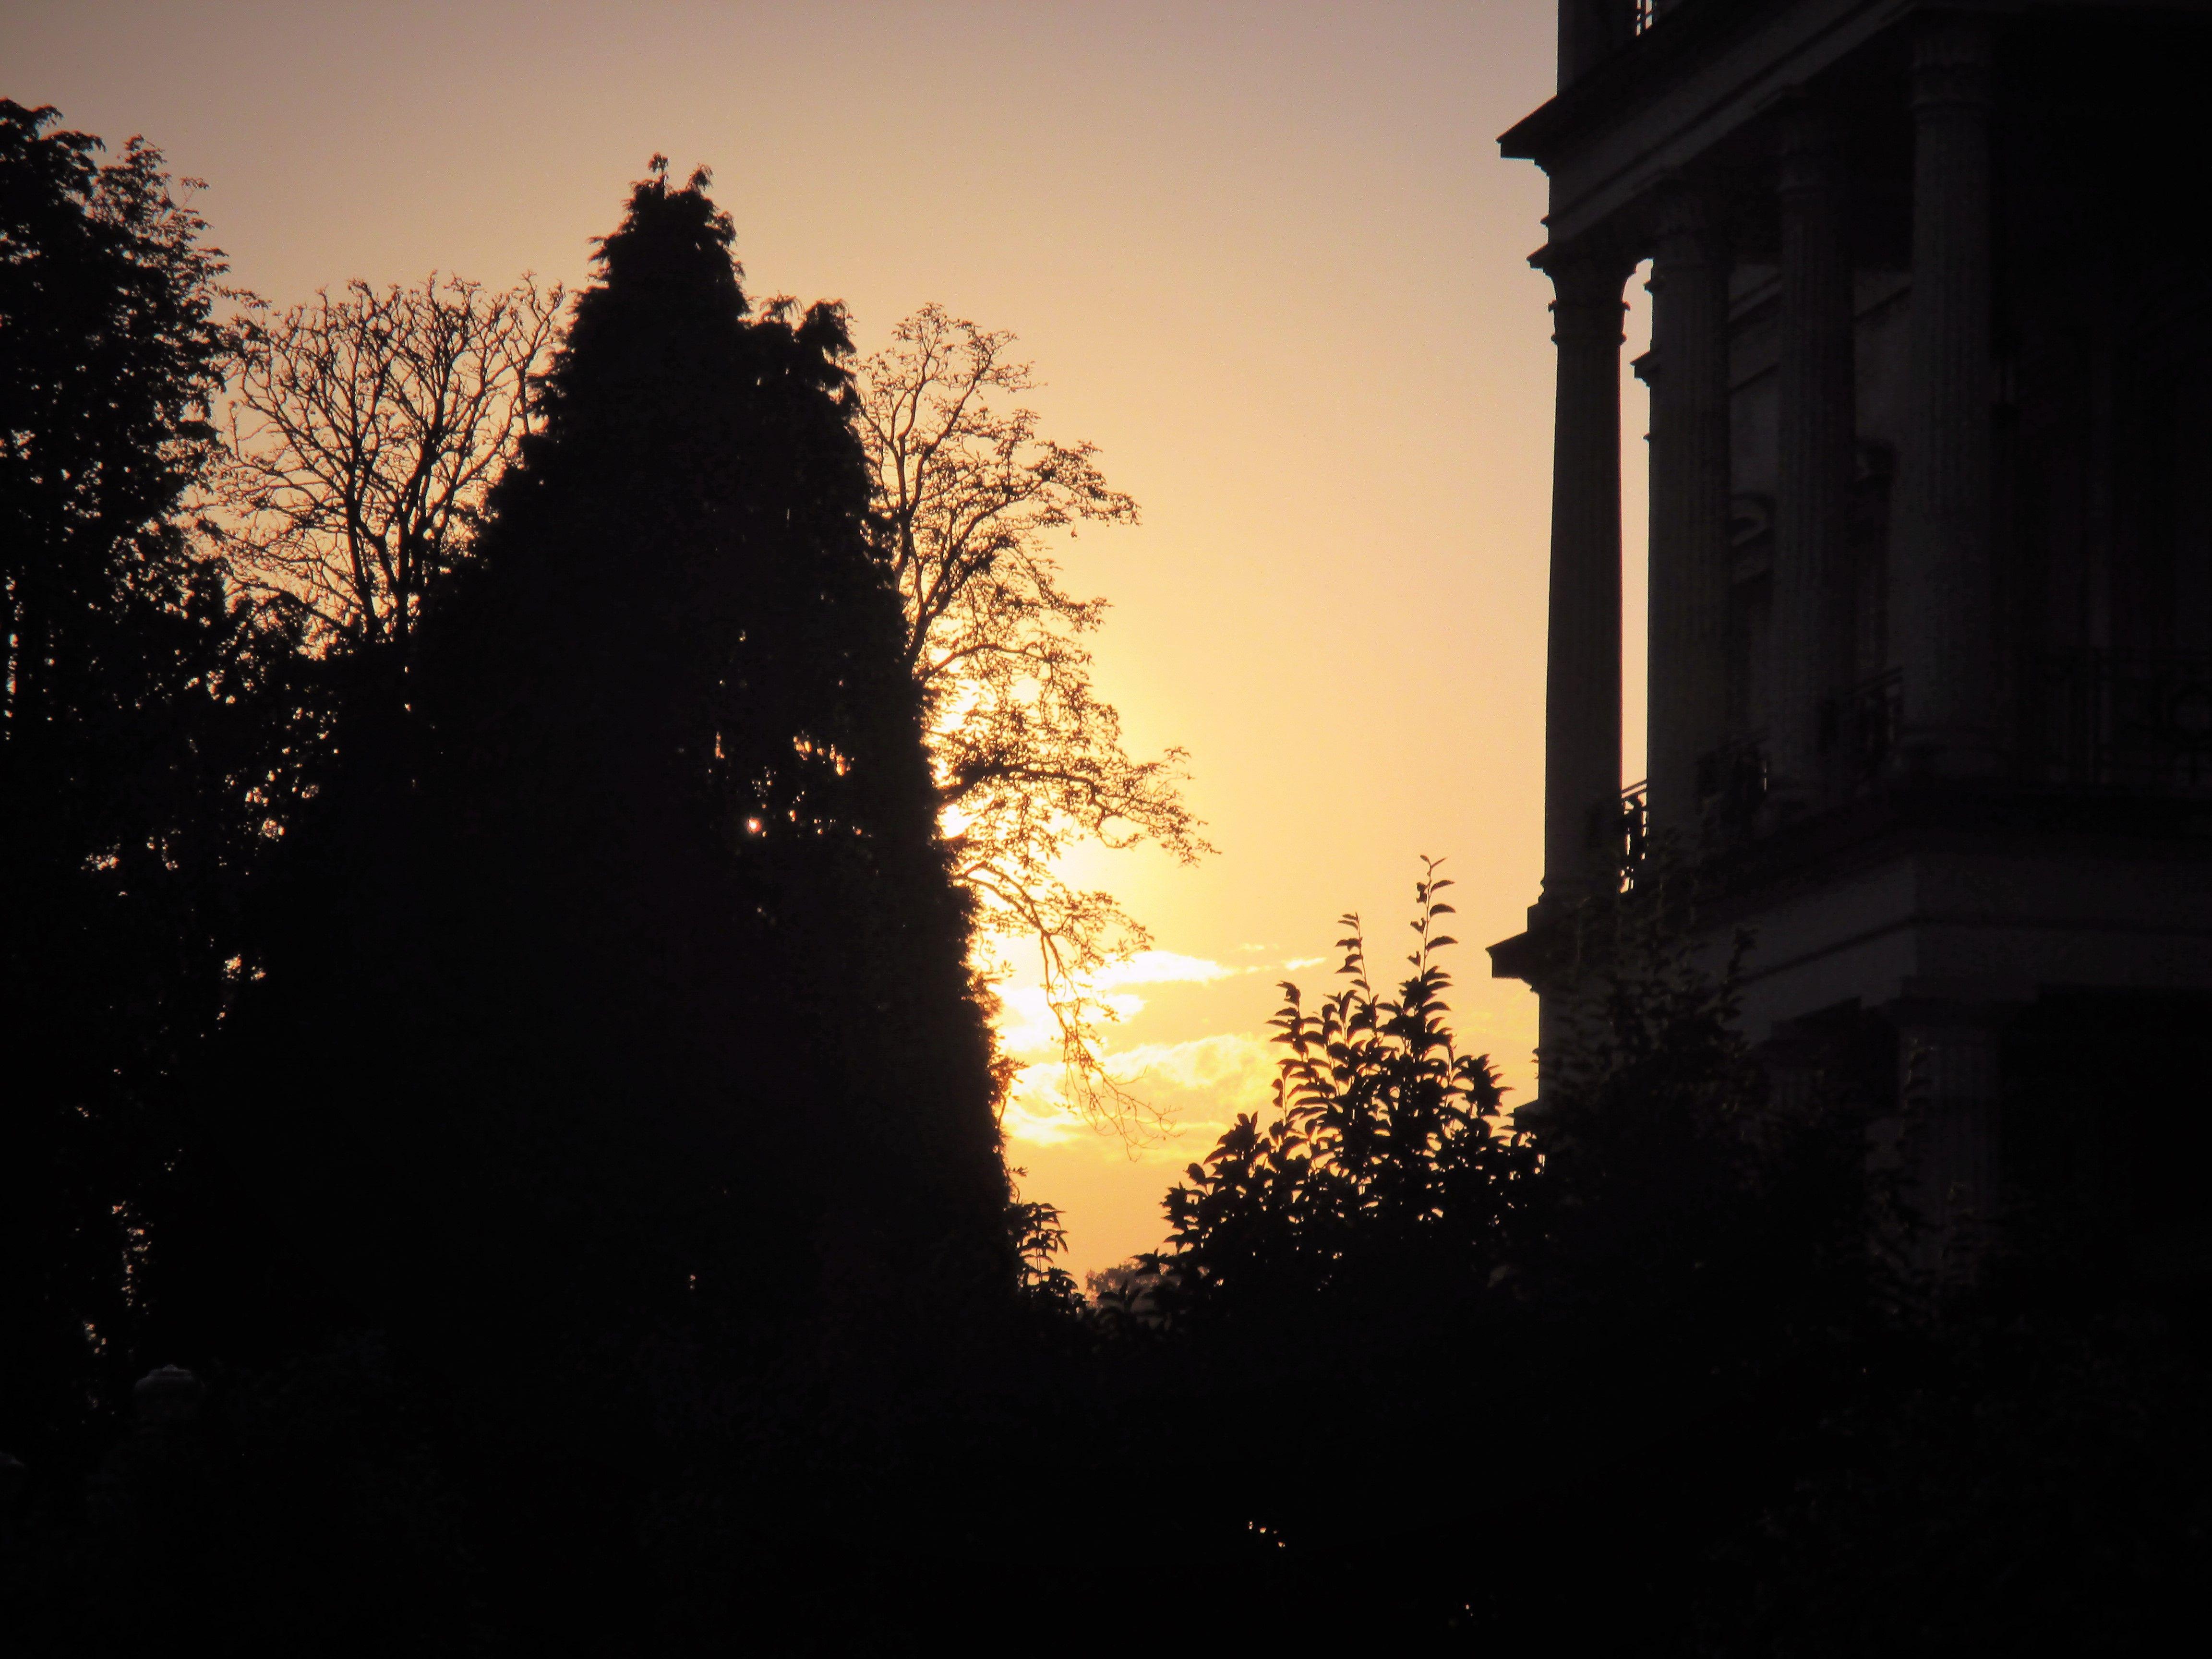 Sonne, Natur, Himmel, Essen, Villa Hügel, Photography